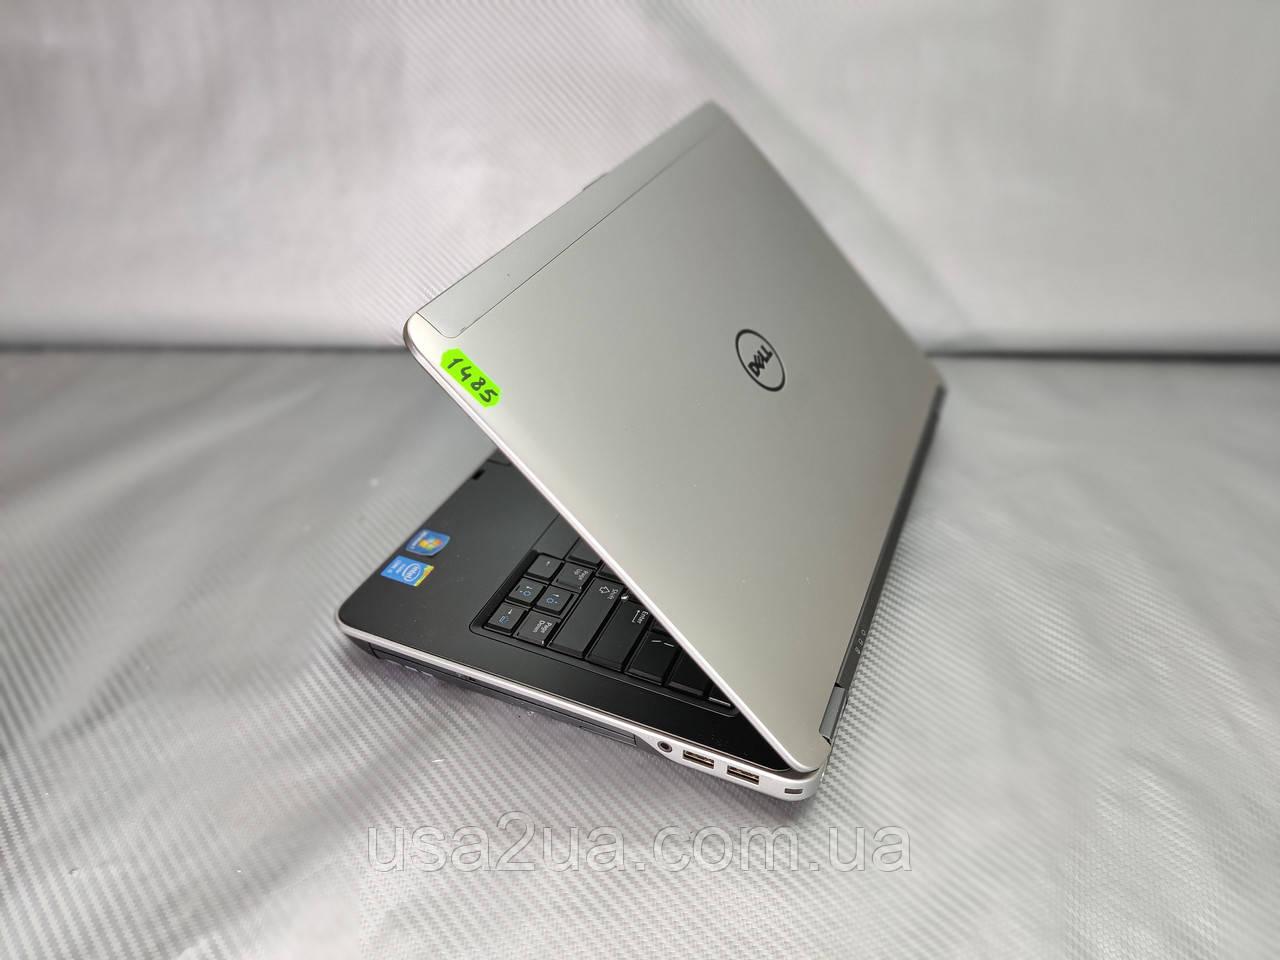 Потужний Ноутбук Dell Latitude E6440 Core i5 4Gen 500gb 8Gb WEB cam Кредит Гарантія Доставка